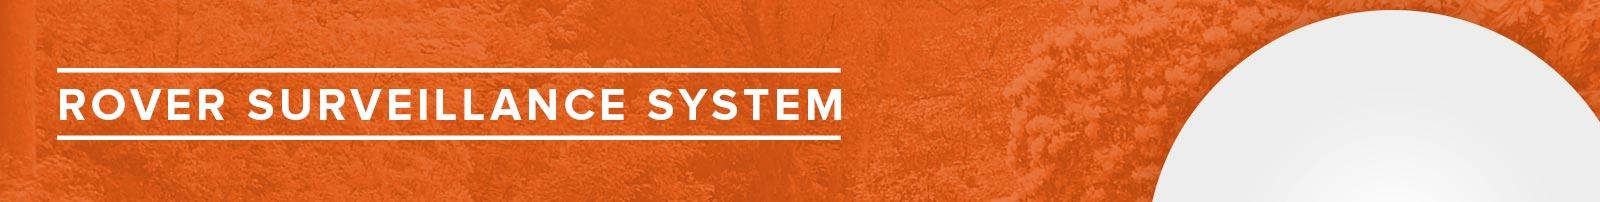 Rover Surveillance System